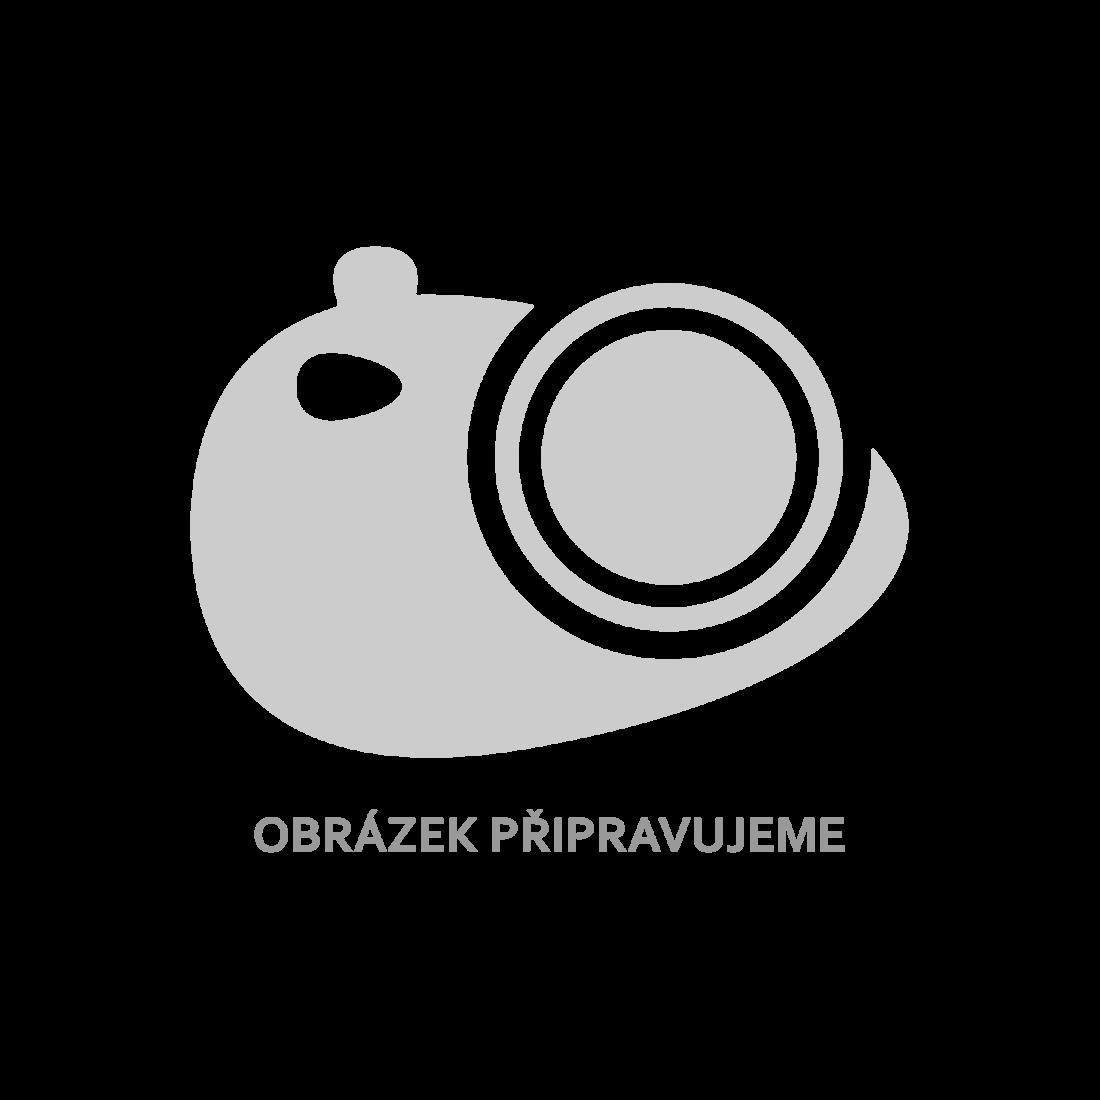 Roleta den a noc / Zebra / Twinroll 140x175 cm kávová